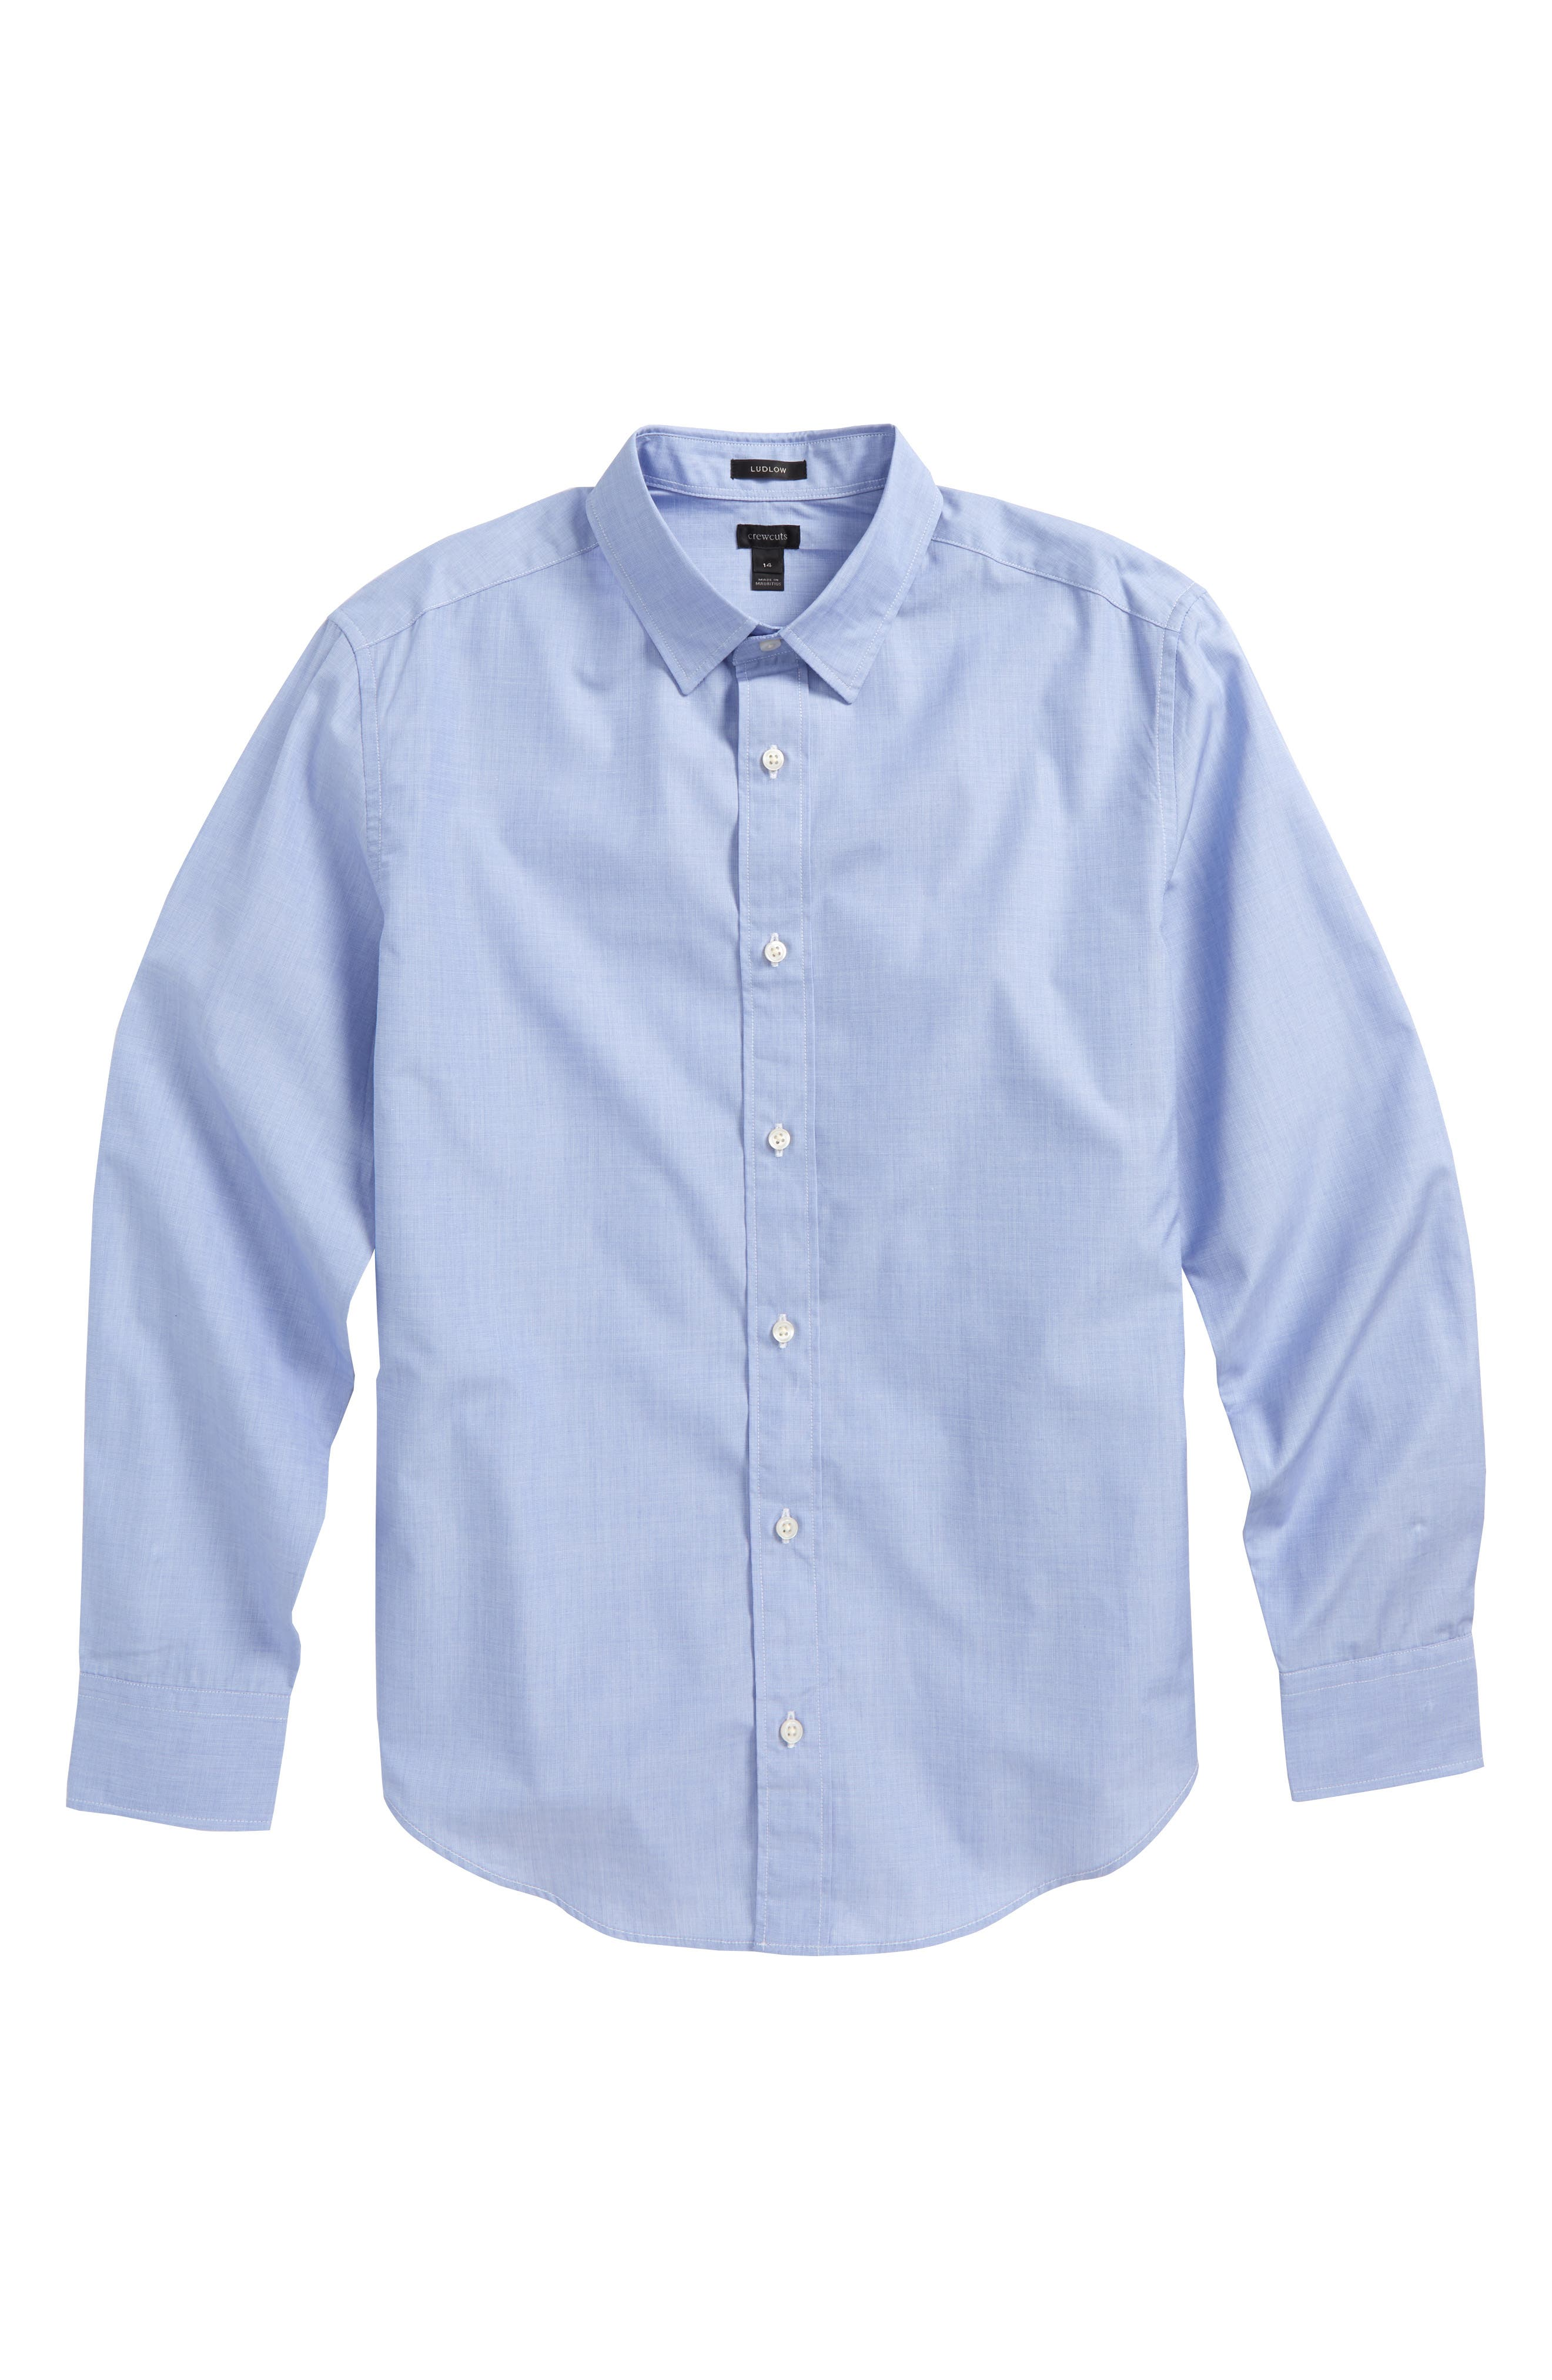 Ludlow Dress Shirt,                             Main thumbnail 1, color,                             400